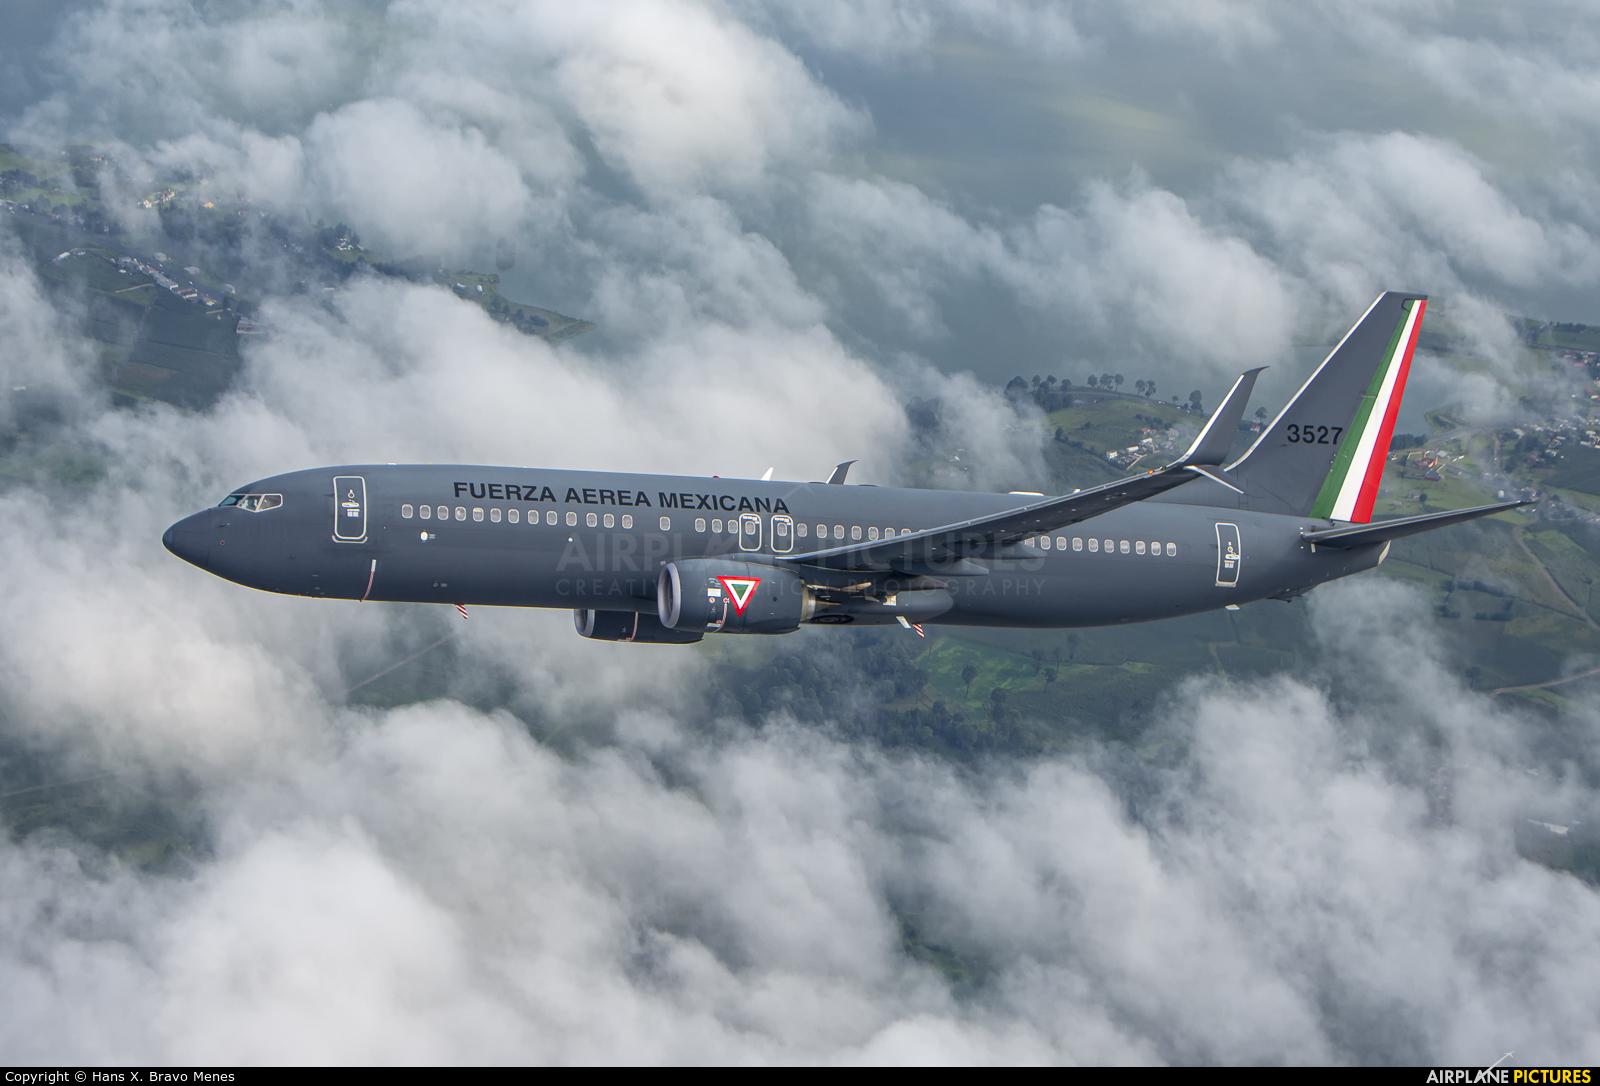 Mexico - Air Force 3527 aircraft at In Flight - Mexico